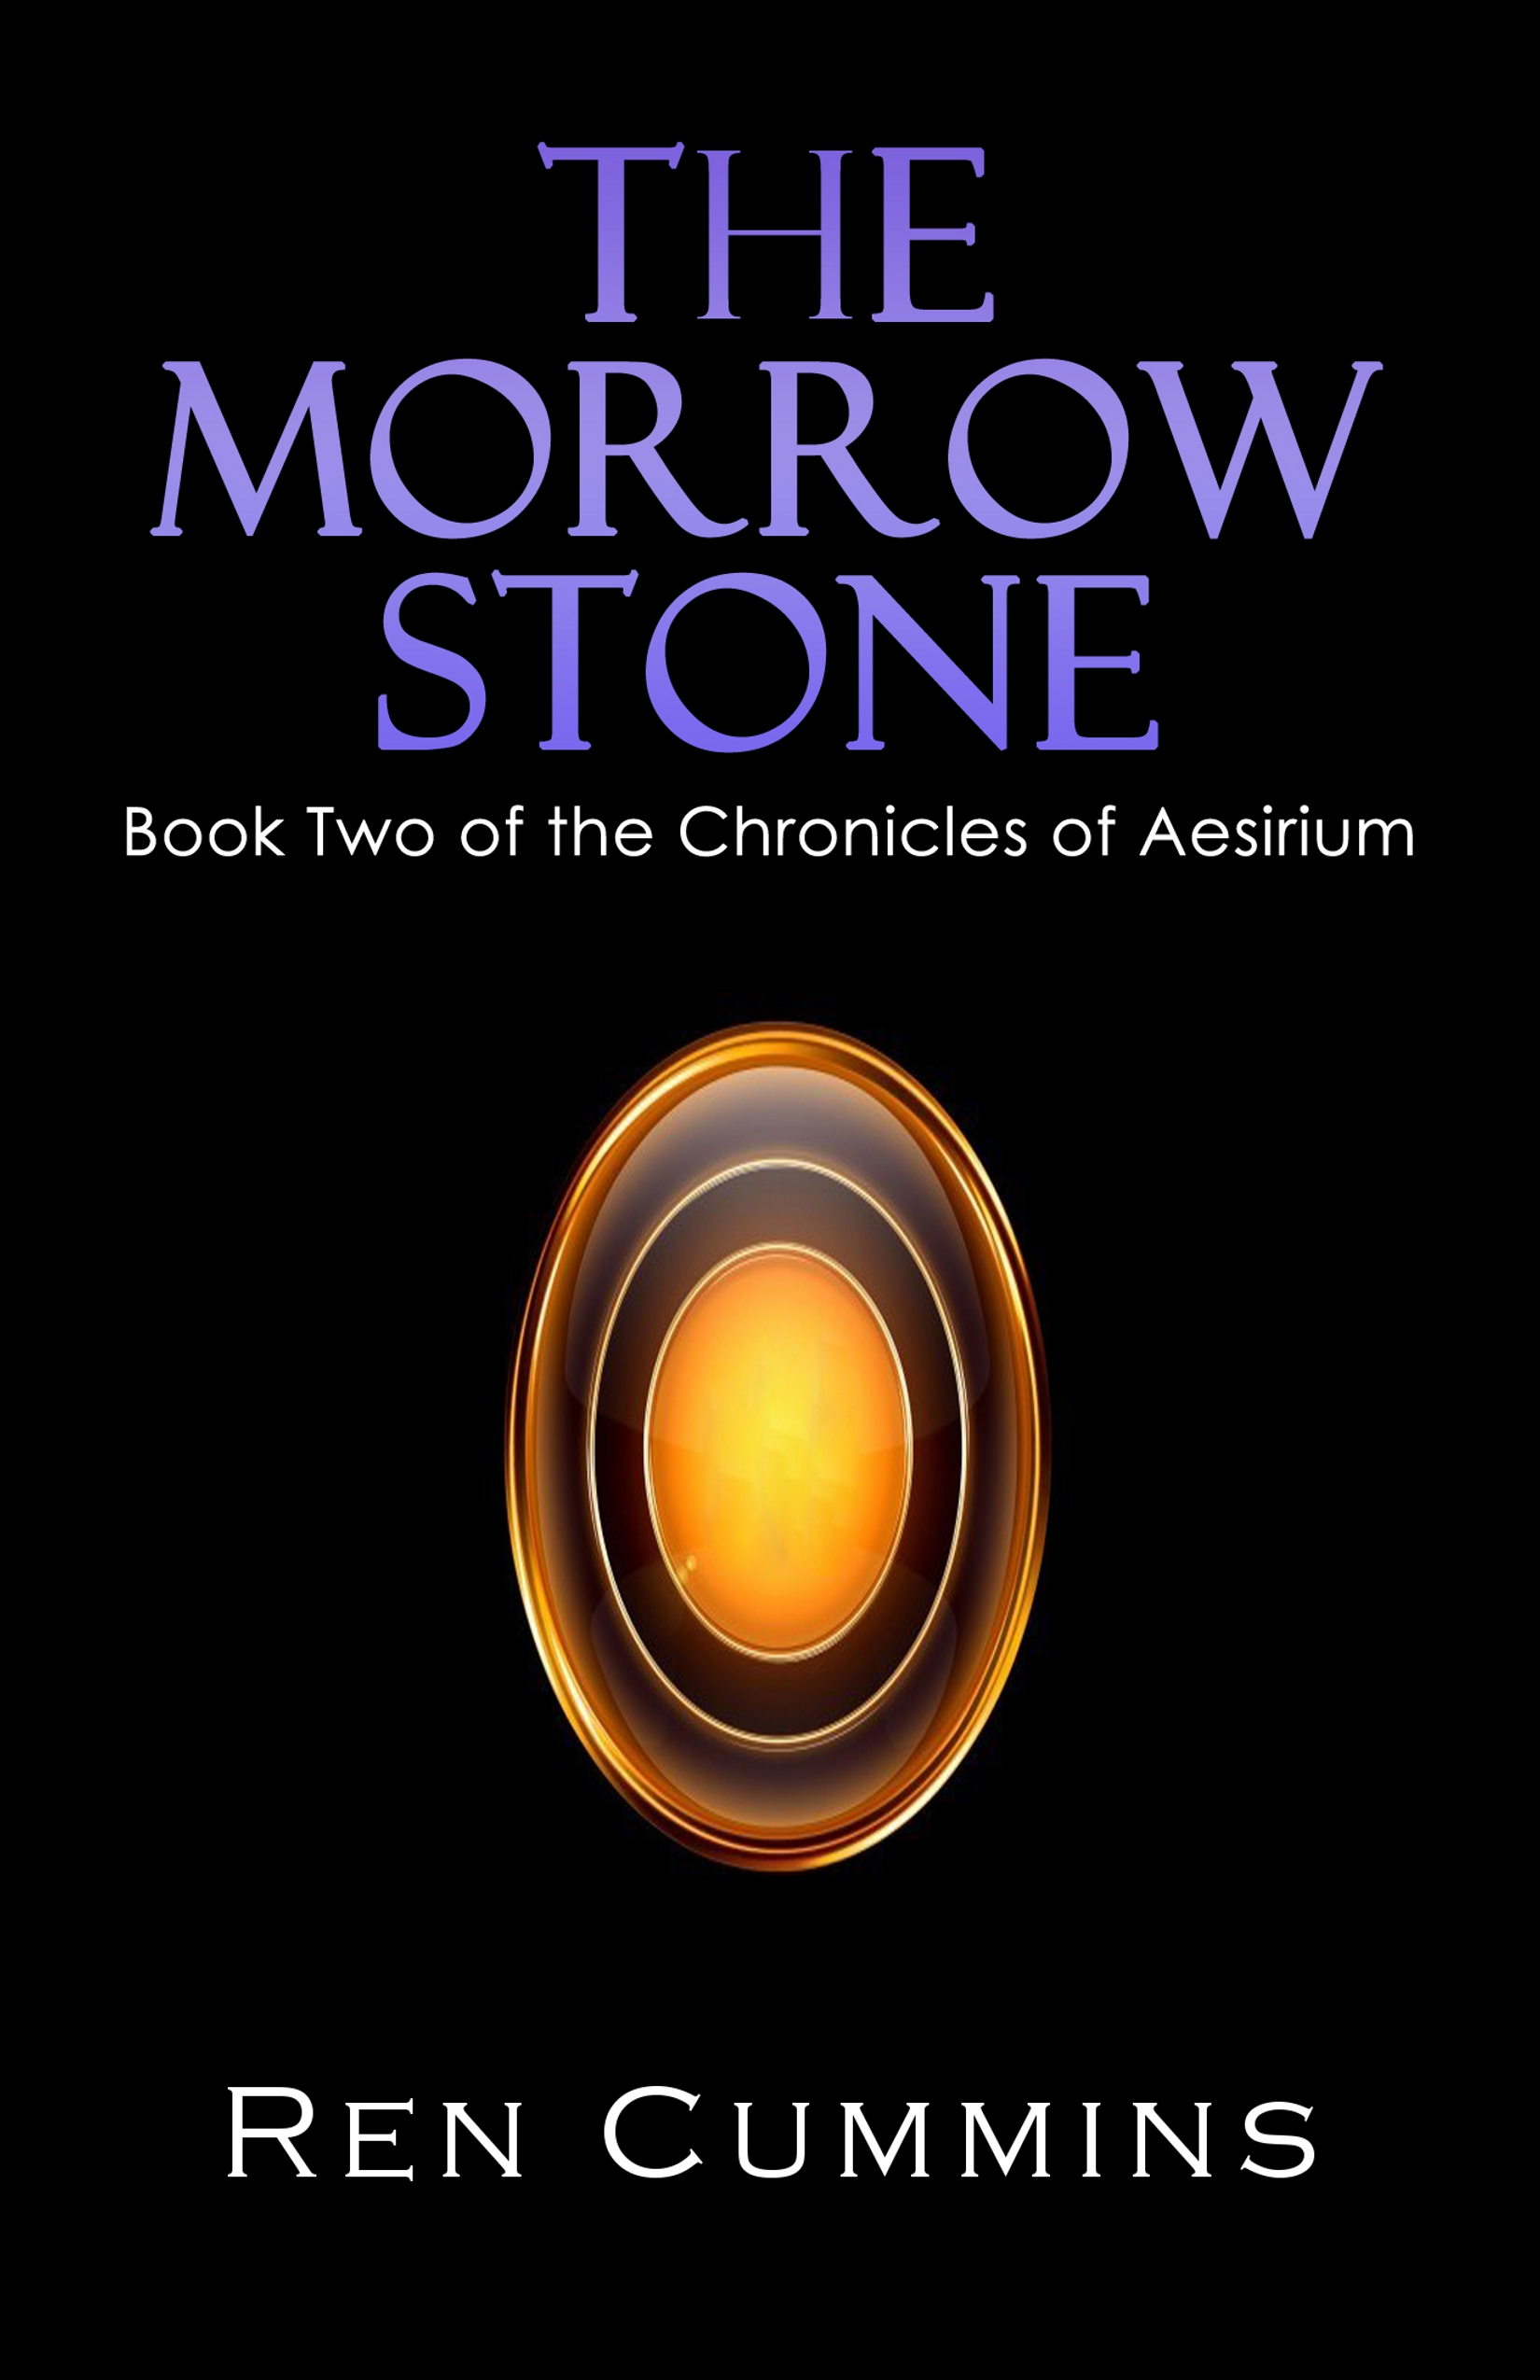 The Morrow Stone